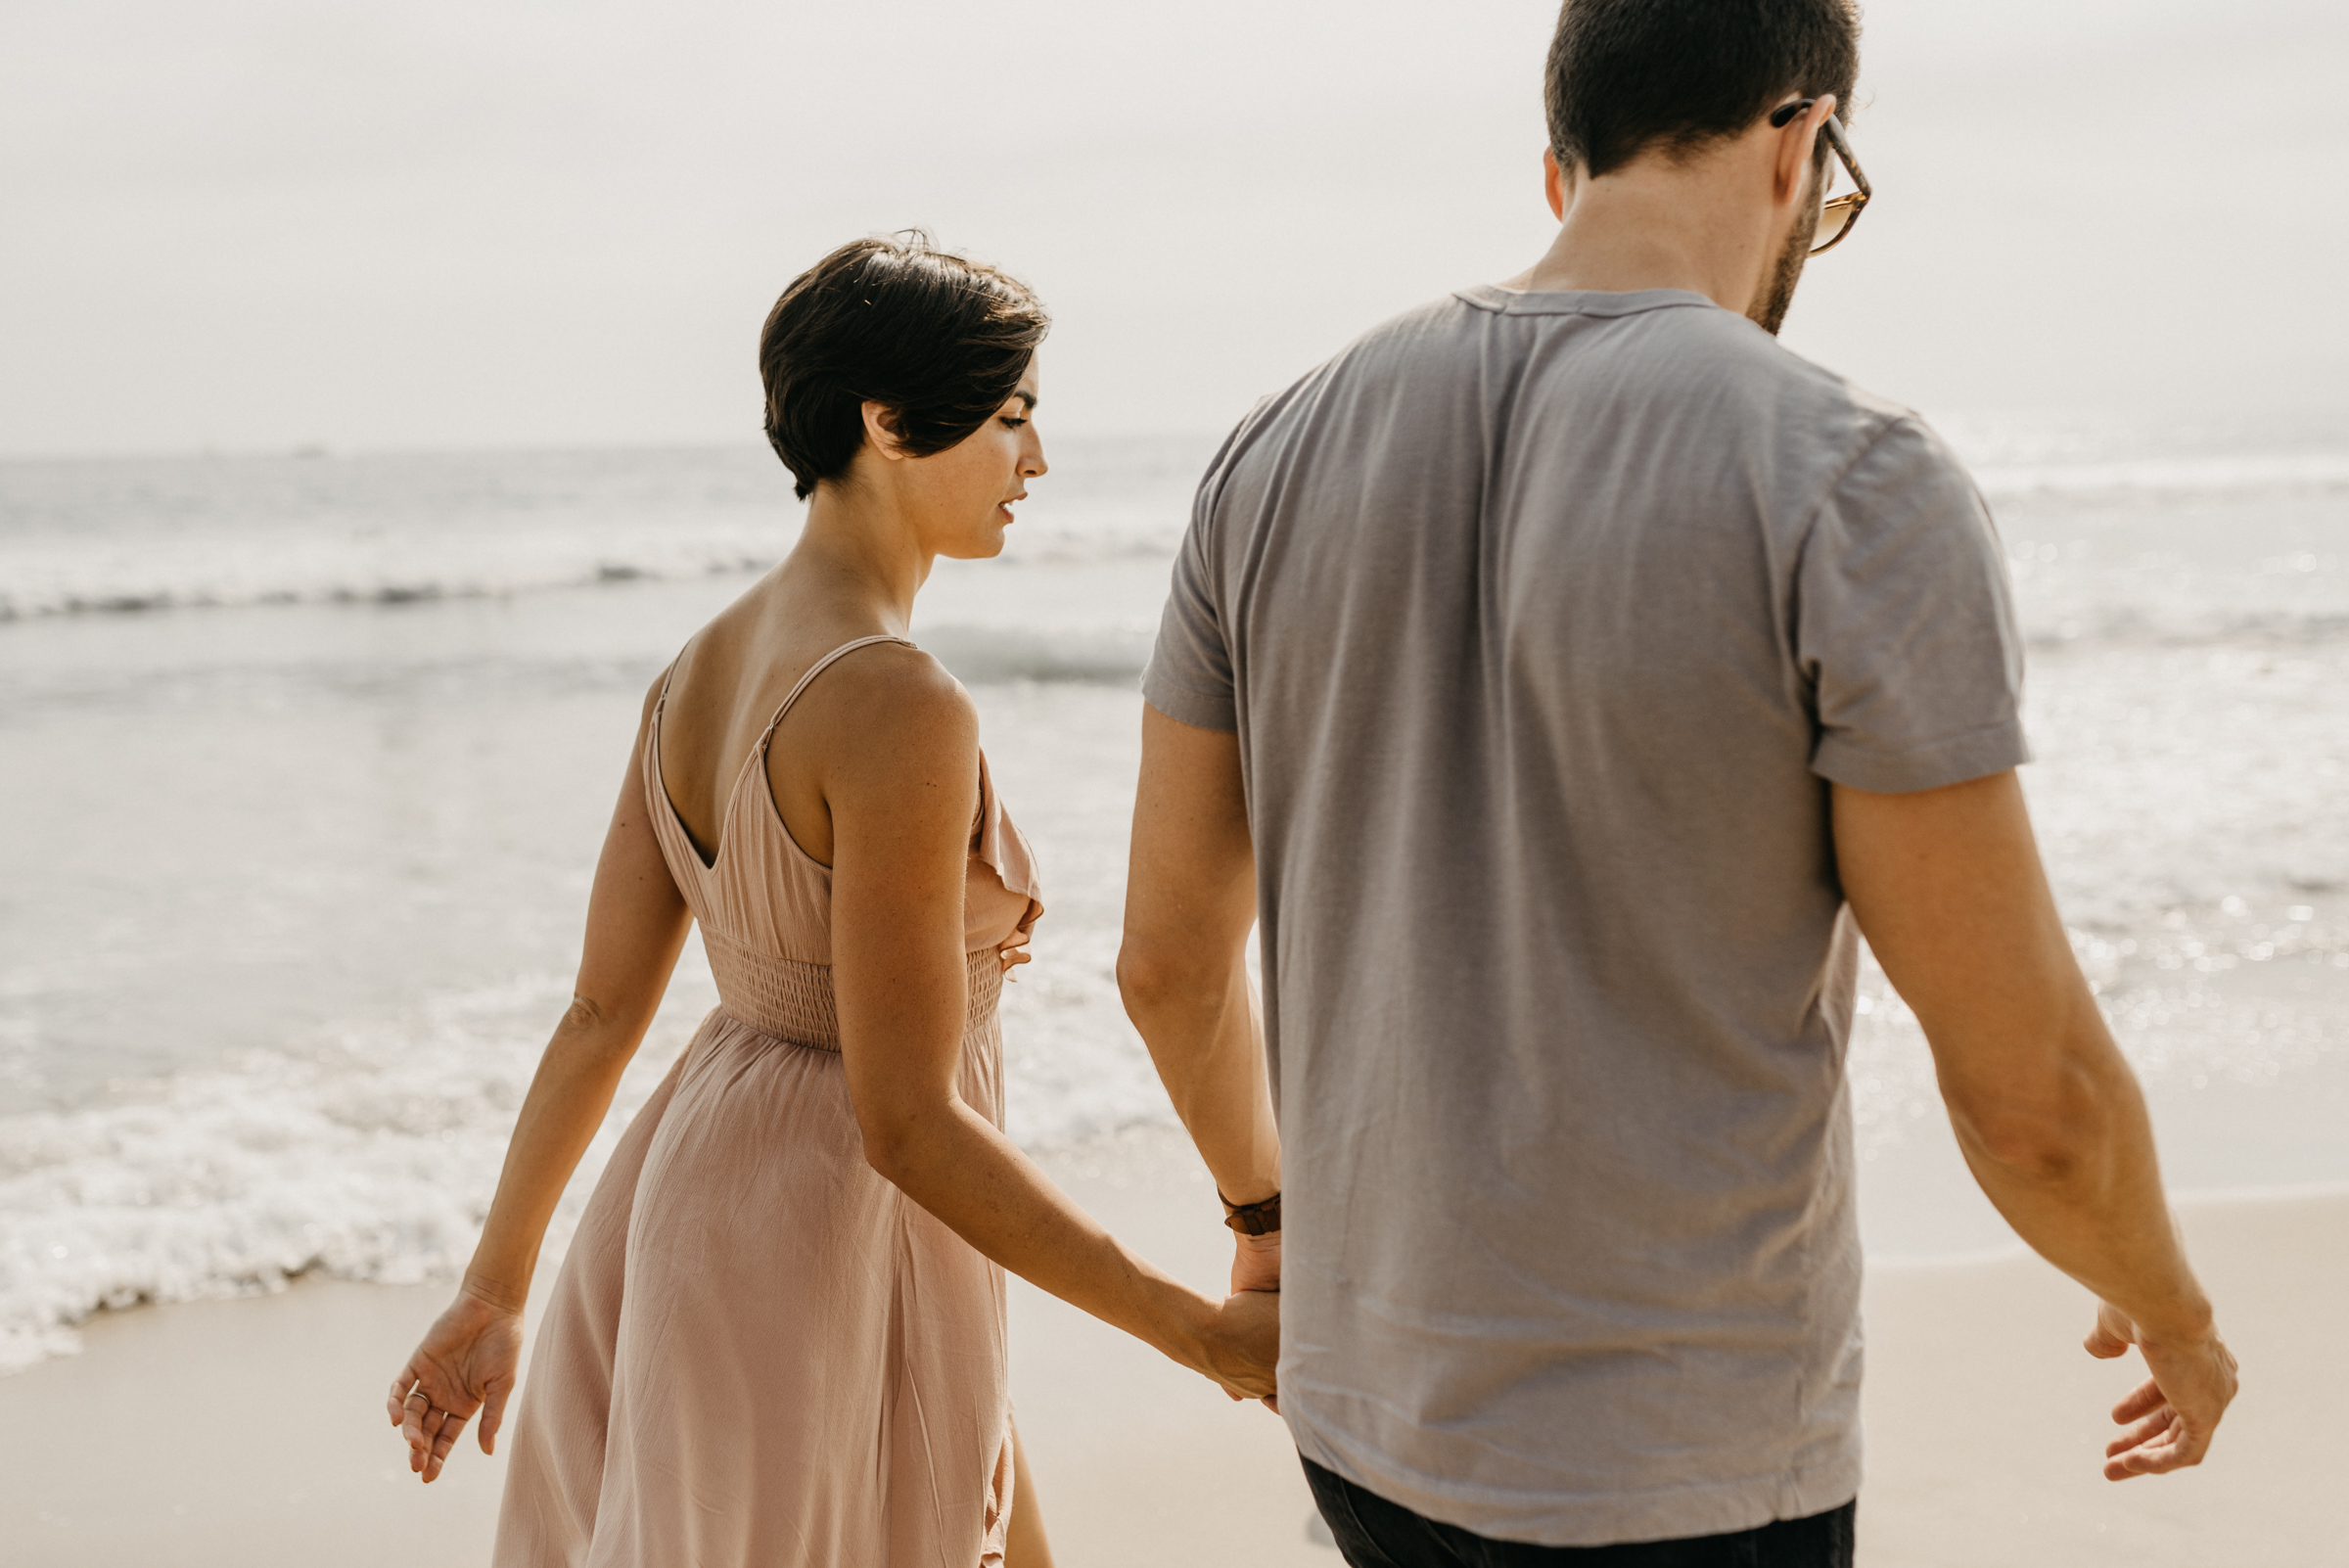 Isaiah + Taylor Photography - Venice Beach & Santa Monica Engagement Session, Los Angeles Wedding Photographer-051.jpg